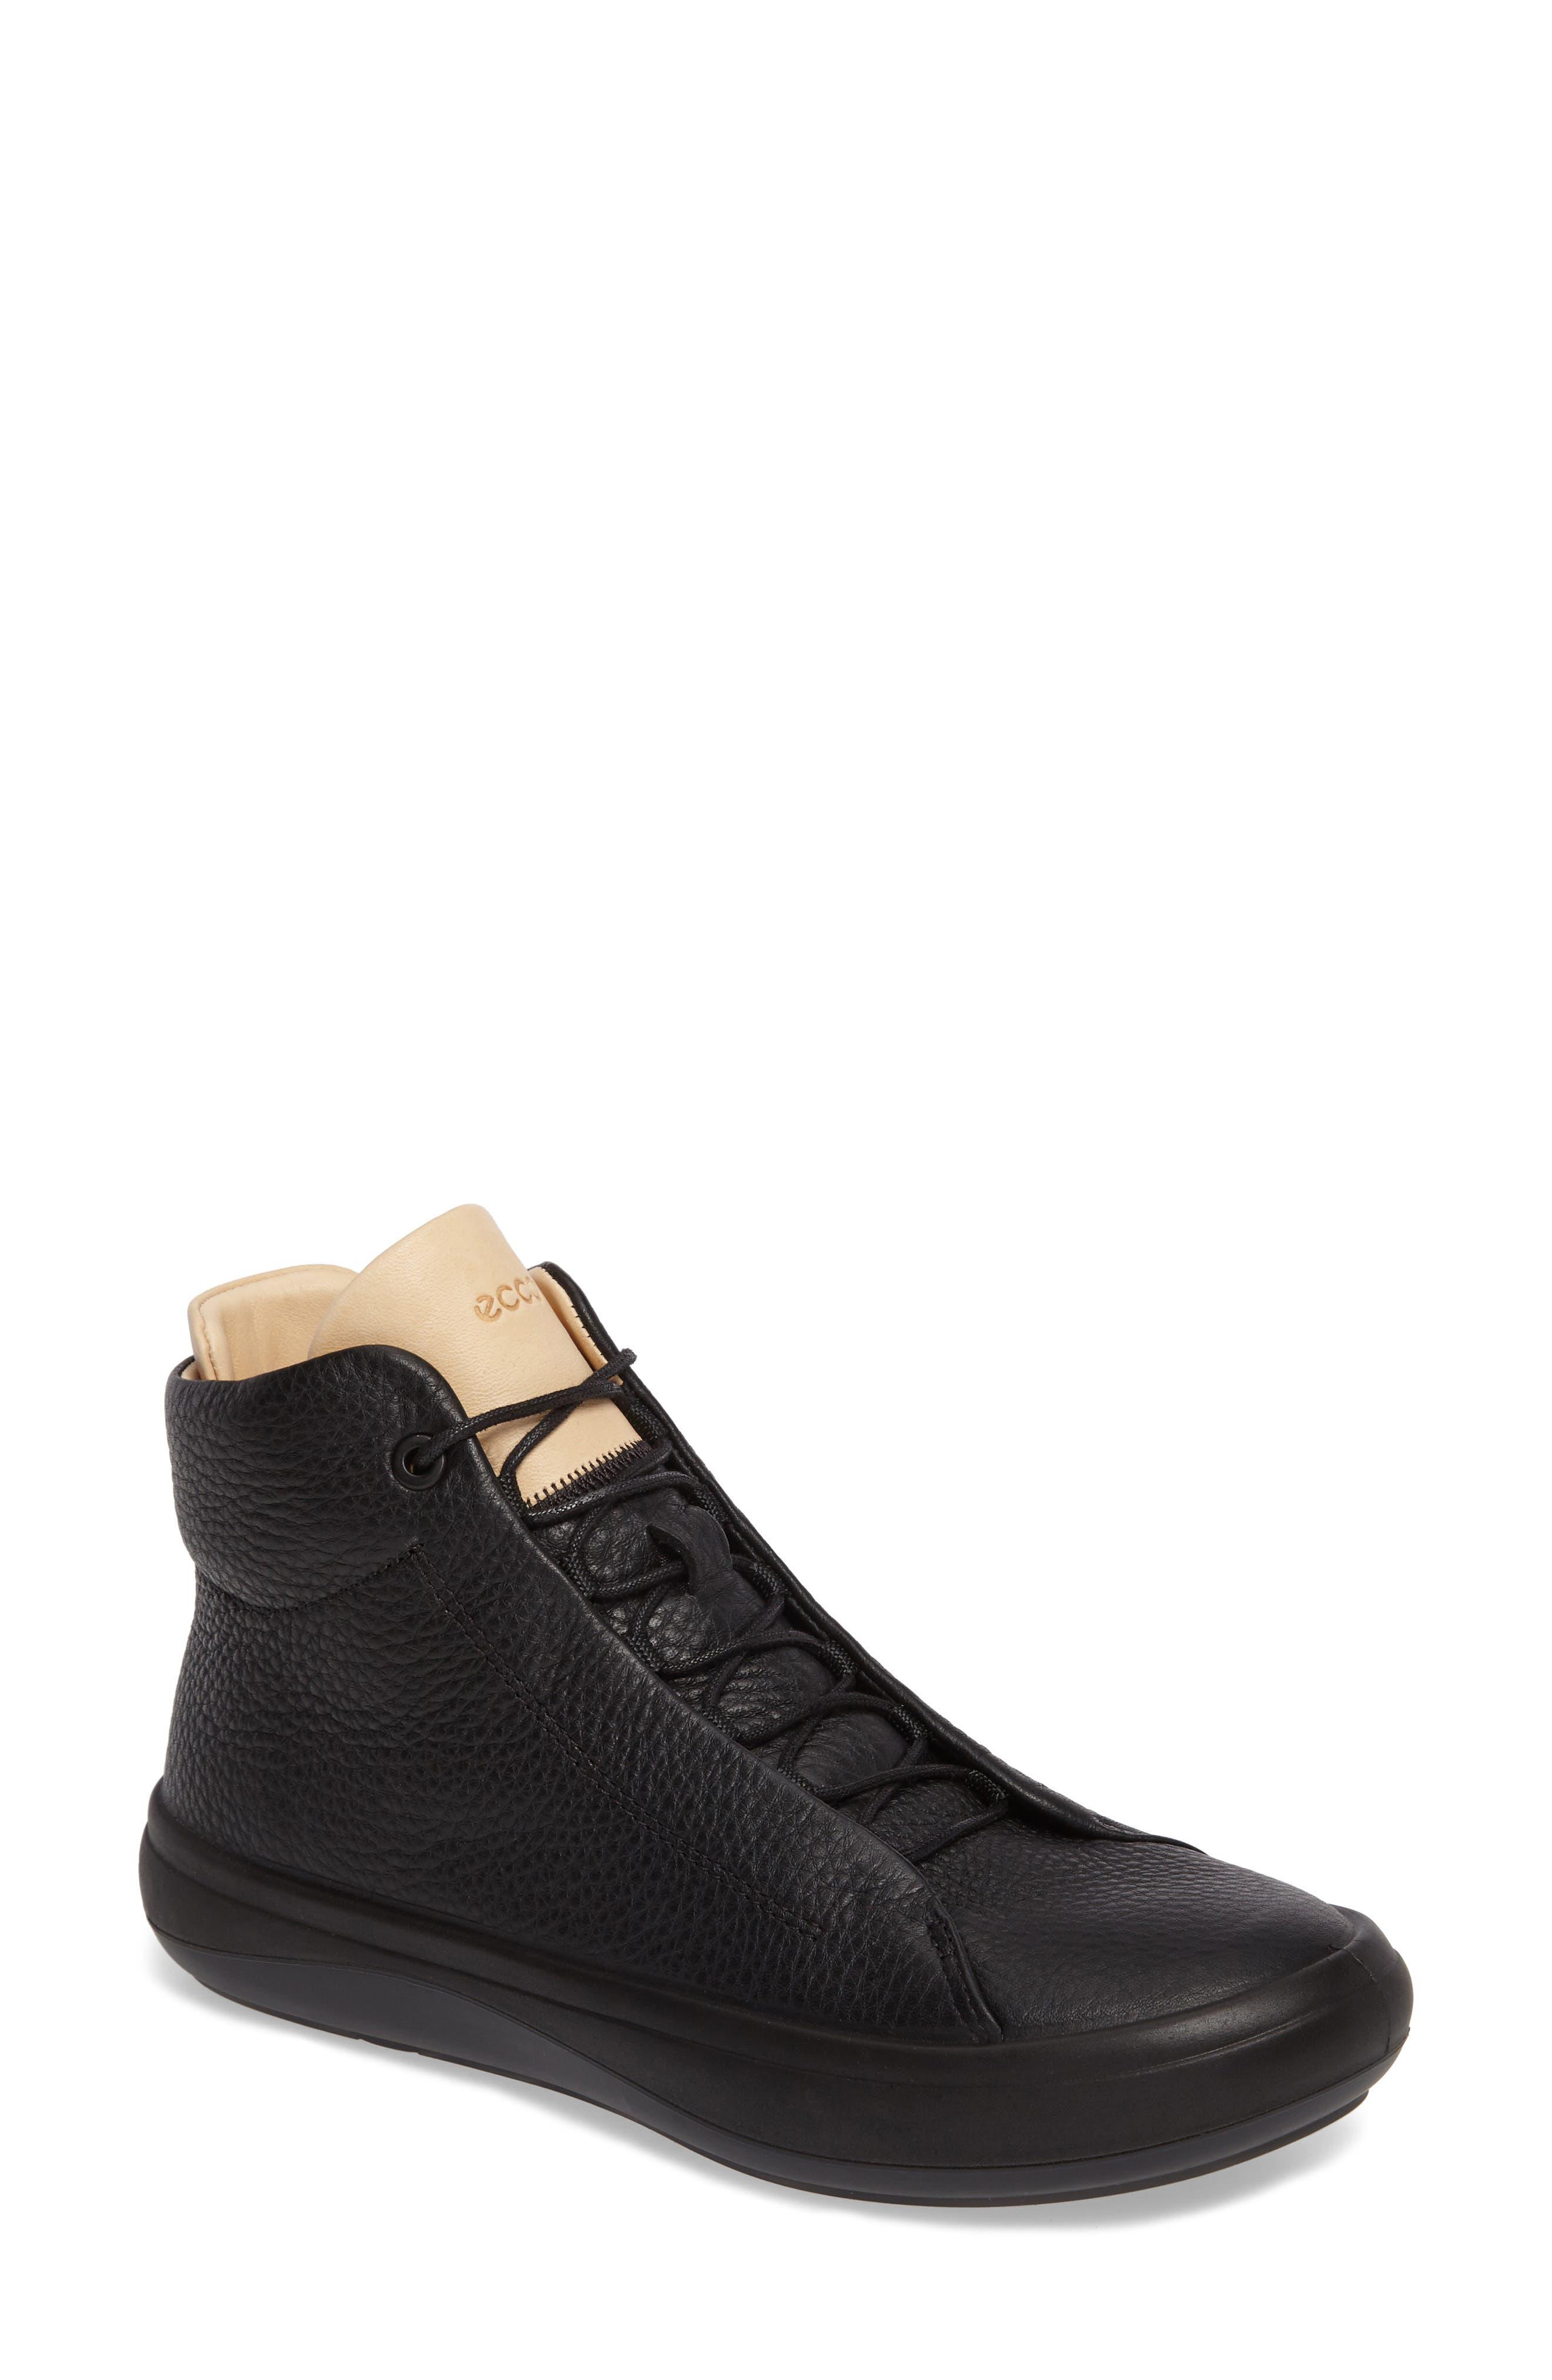 Kinhin Sneaker,                             Main thumbnail 1, color,                             013